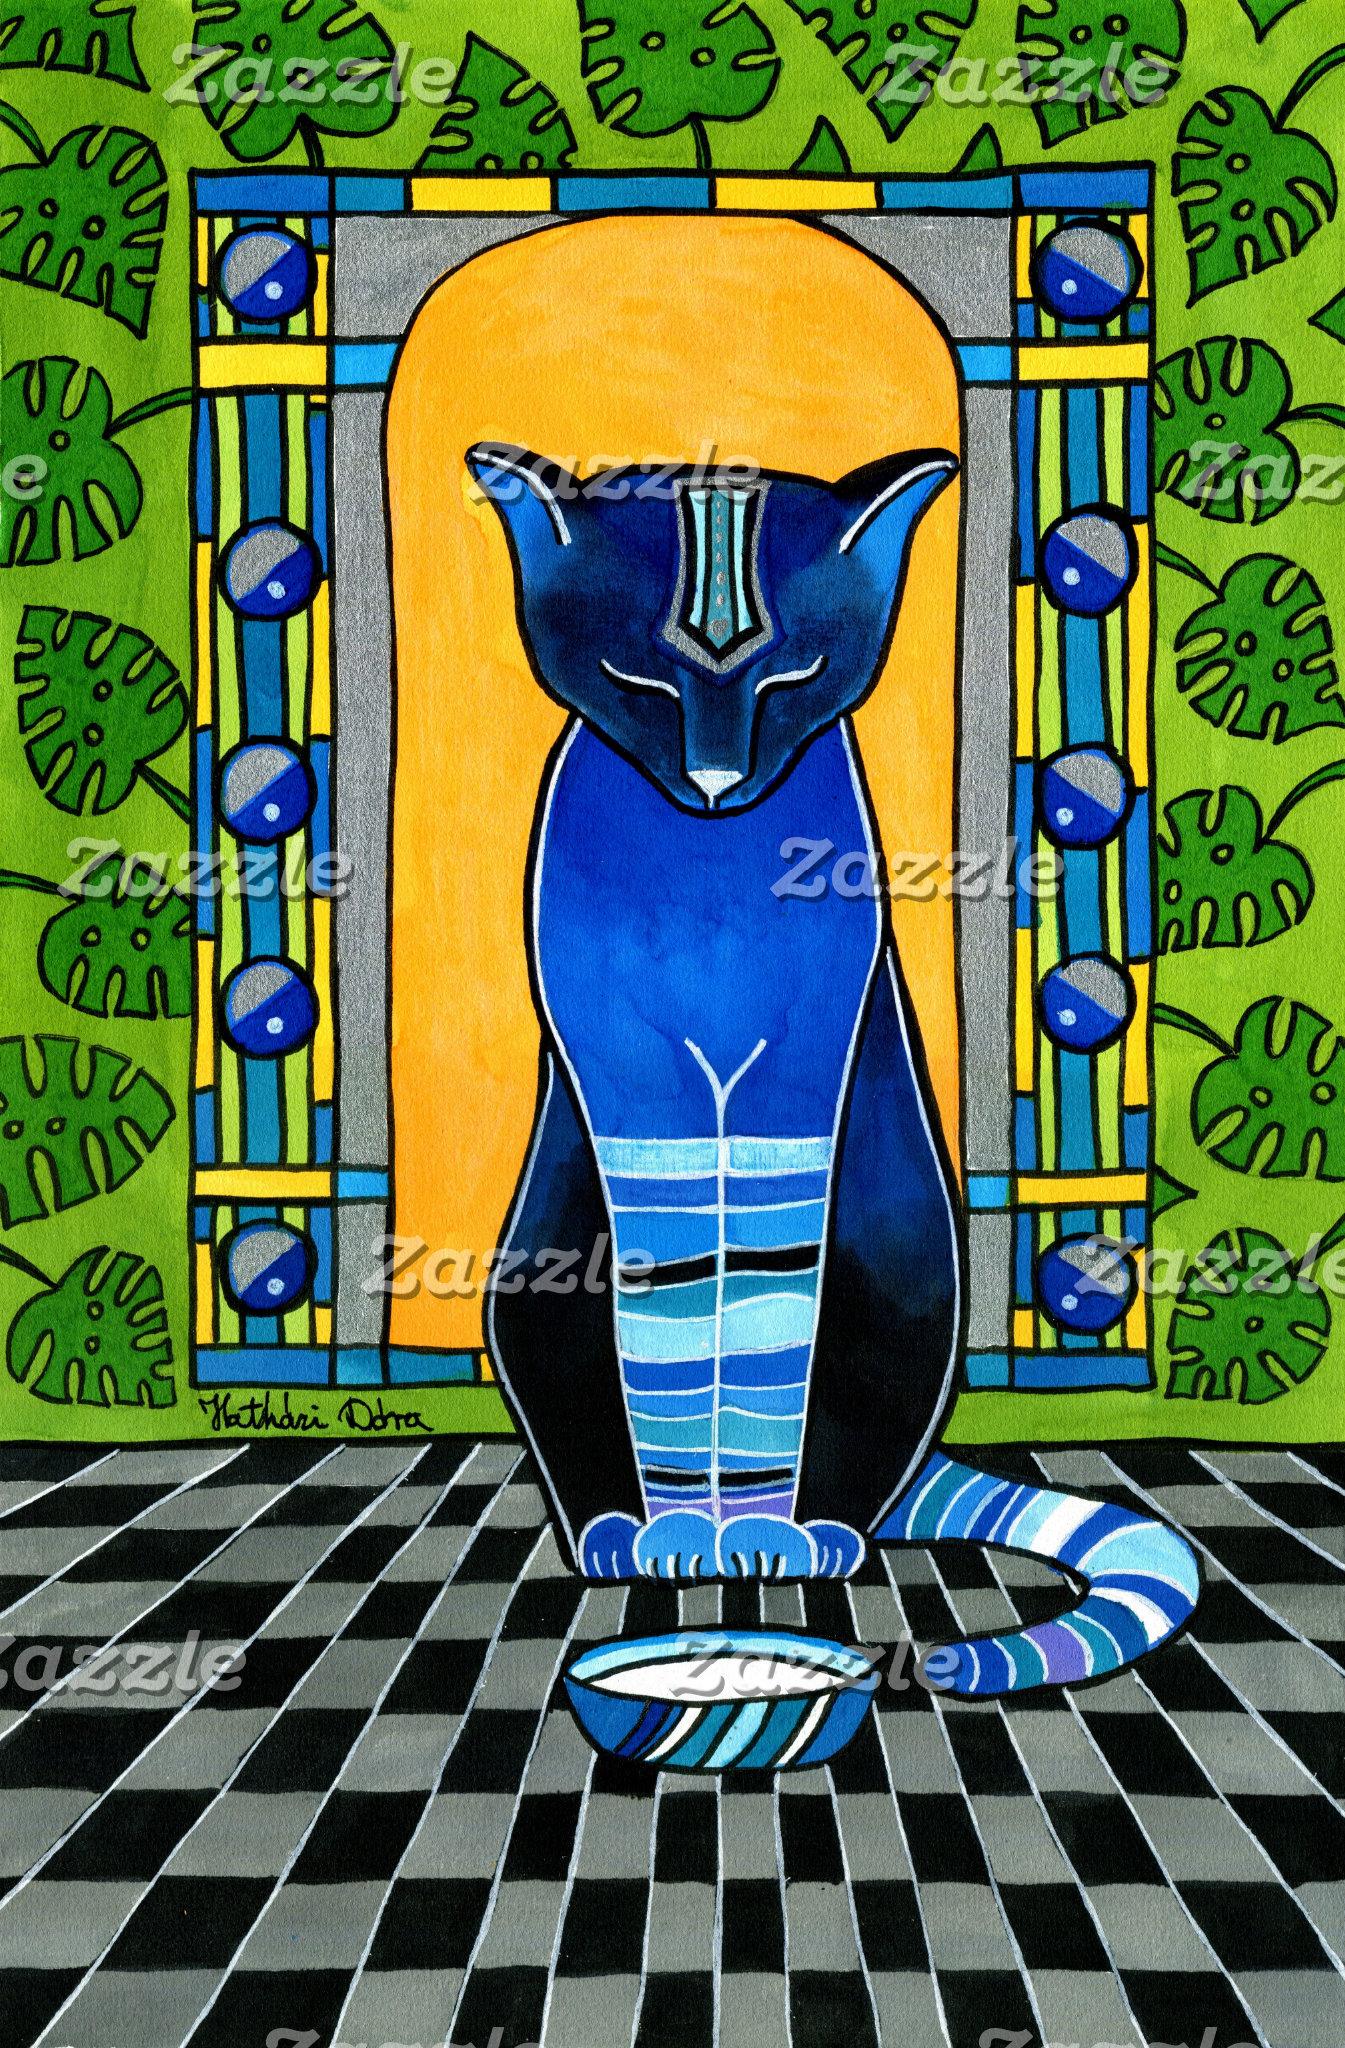 Cat Art - He is Back - Blue Cat painting